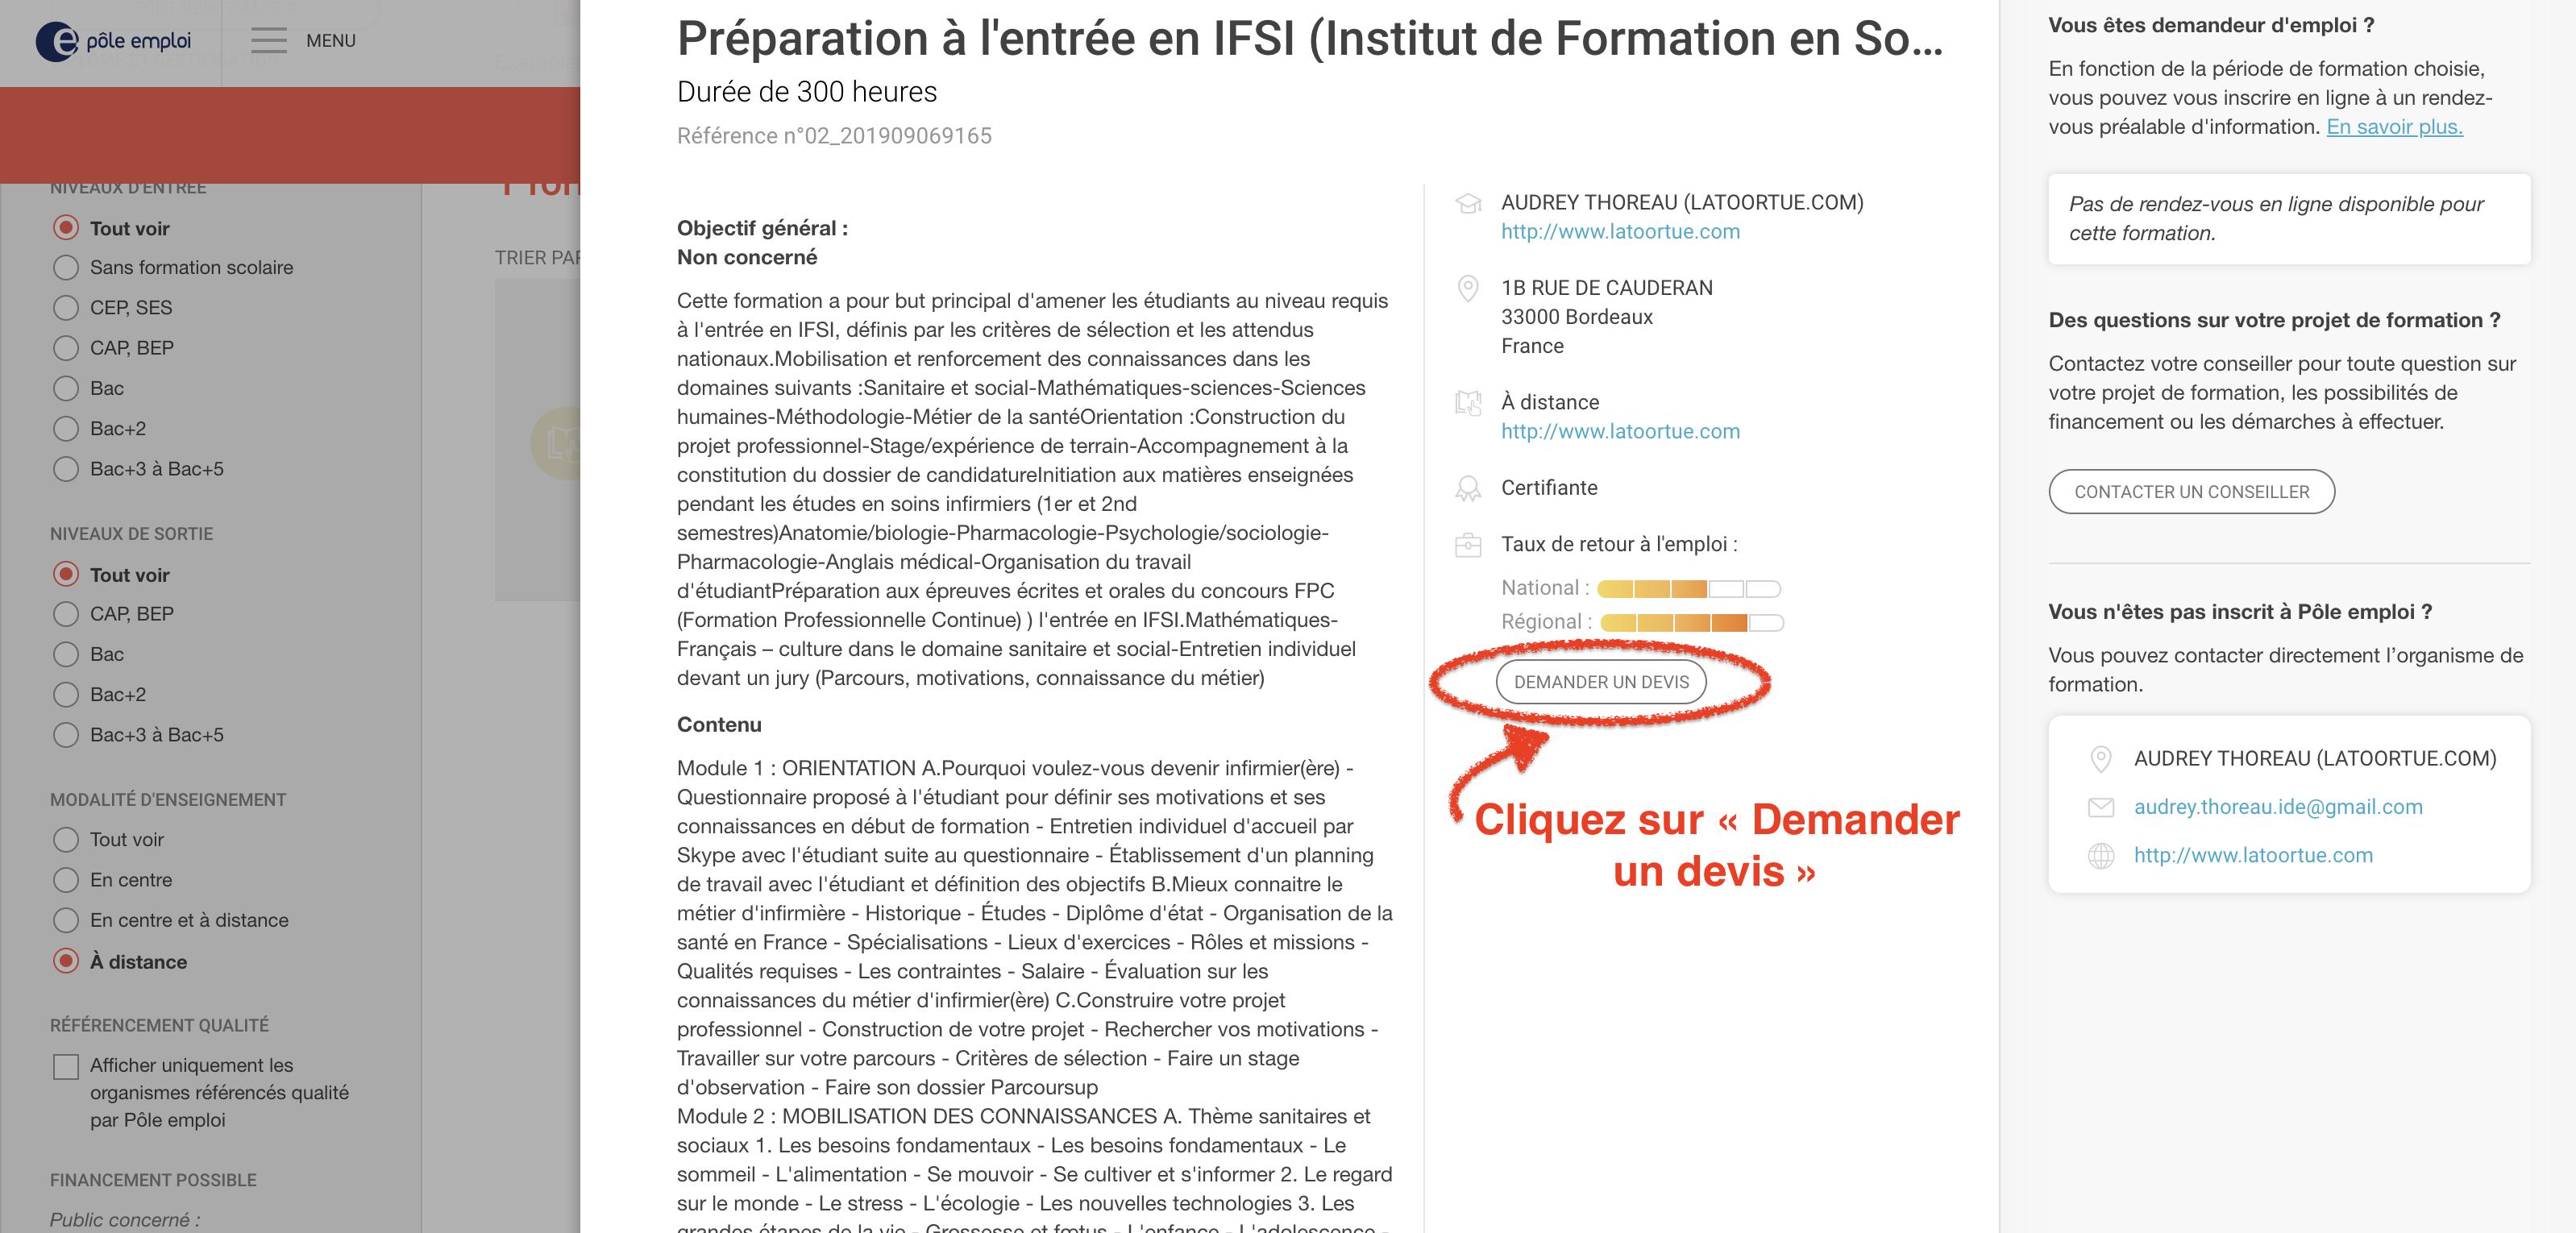 financement pôle-emploi prepa IFSI